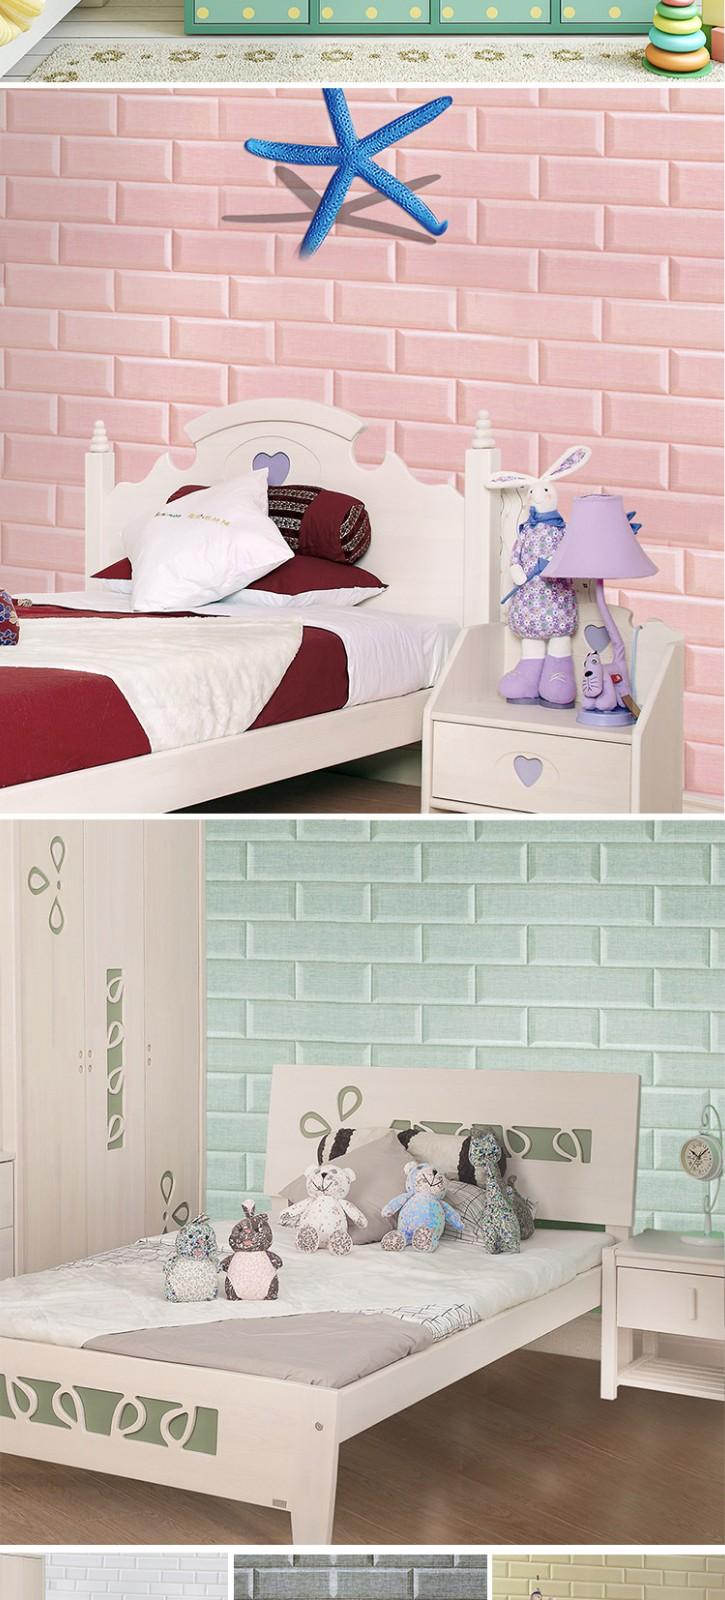 SUNYE best value foam ceiling tiles cheap best supplier for hotel-4